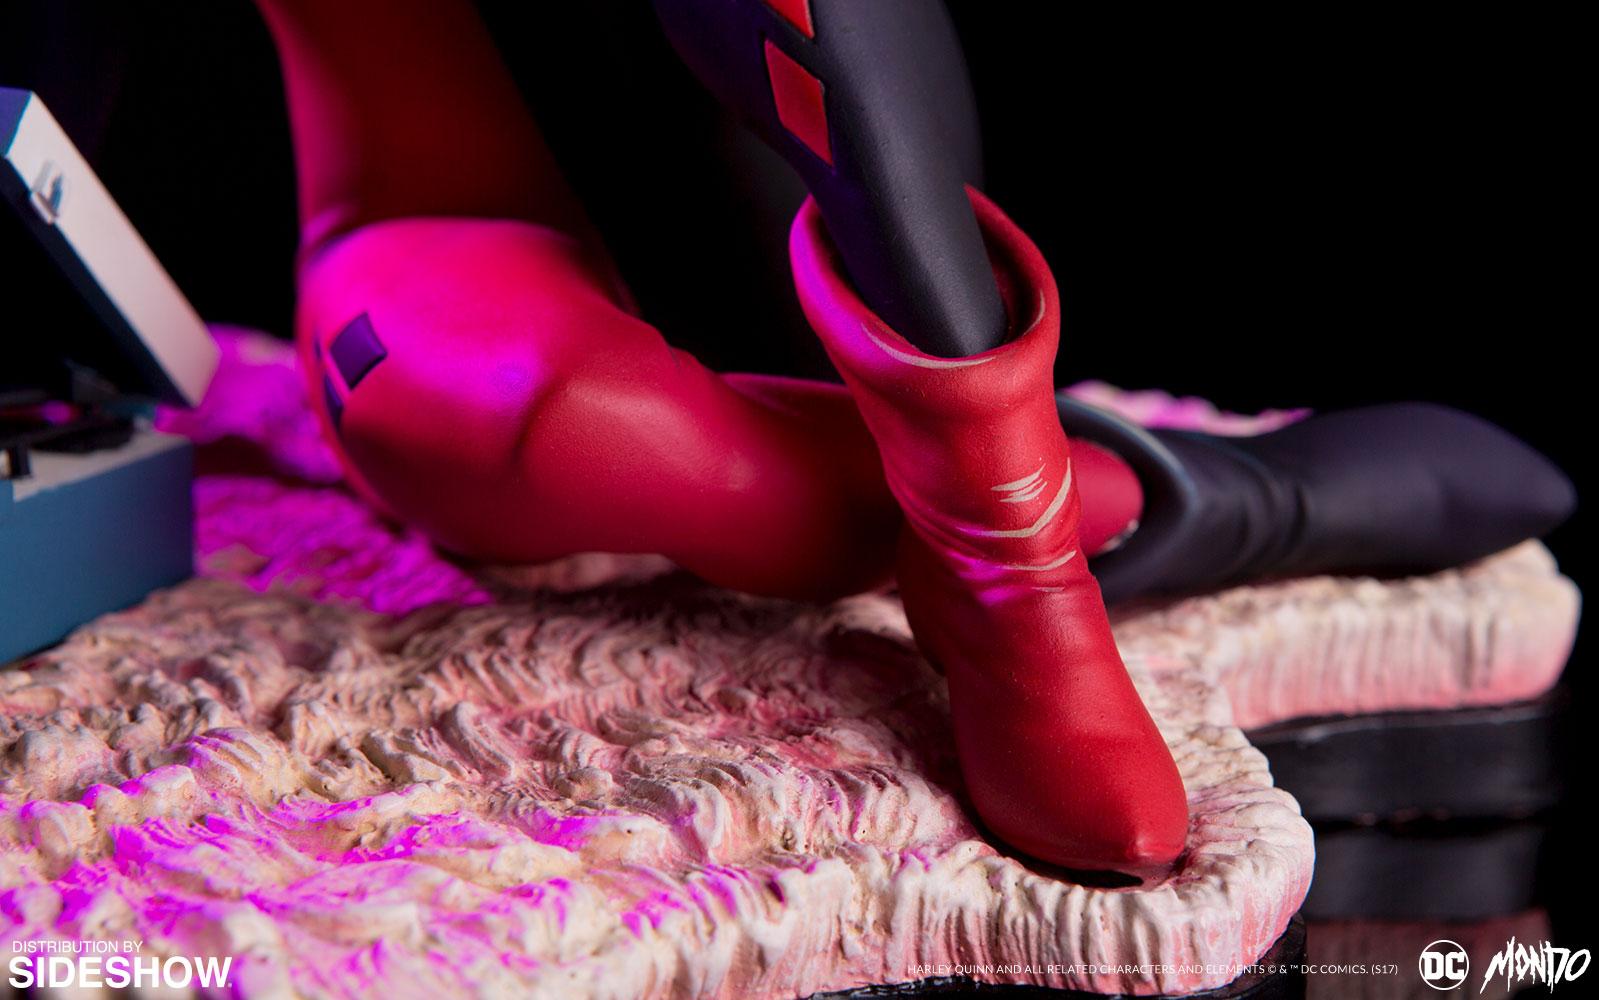 dc-comics-waiting-for-my-j-man-harley-quinn-statue-mondo-902952-04 Figurine - Harley Quinn - Waiting for My J Man